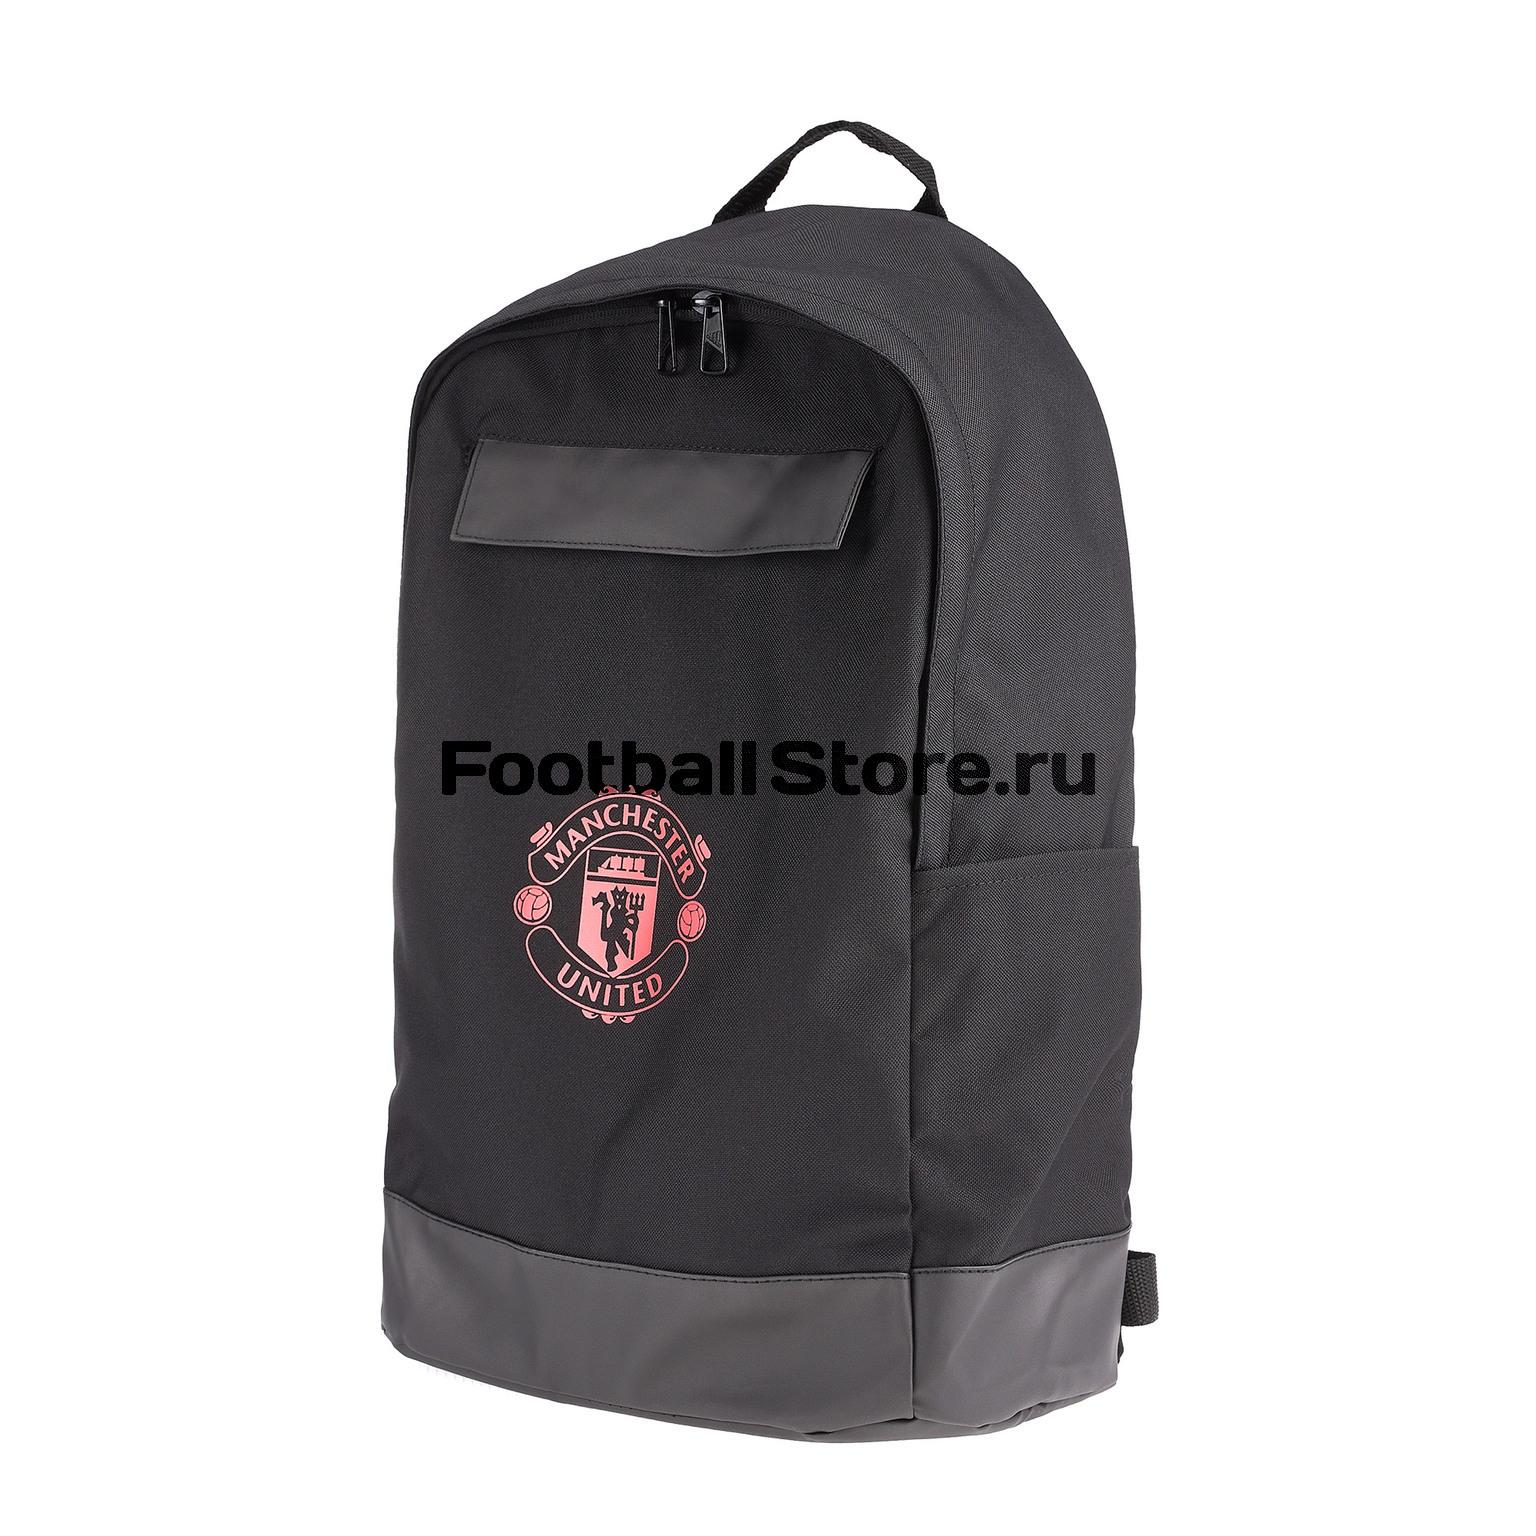 Рюкзак Adidas Manchester United CY5583 рюкзак adidas